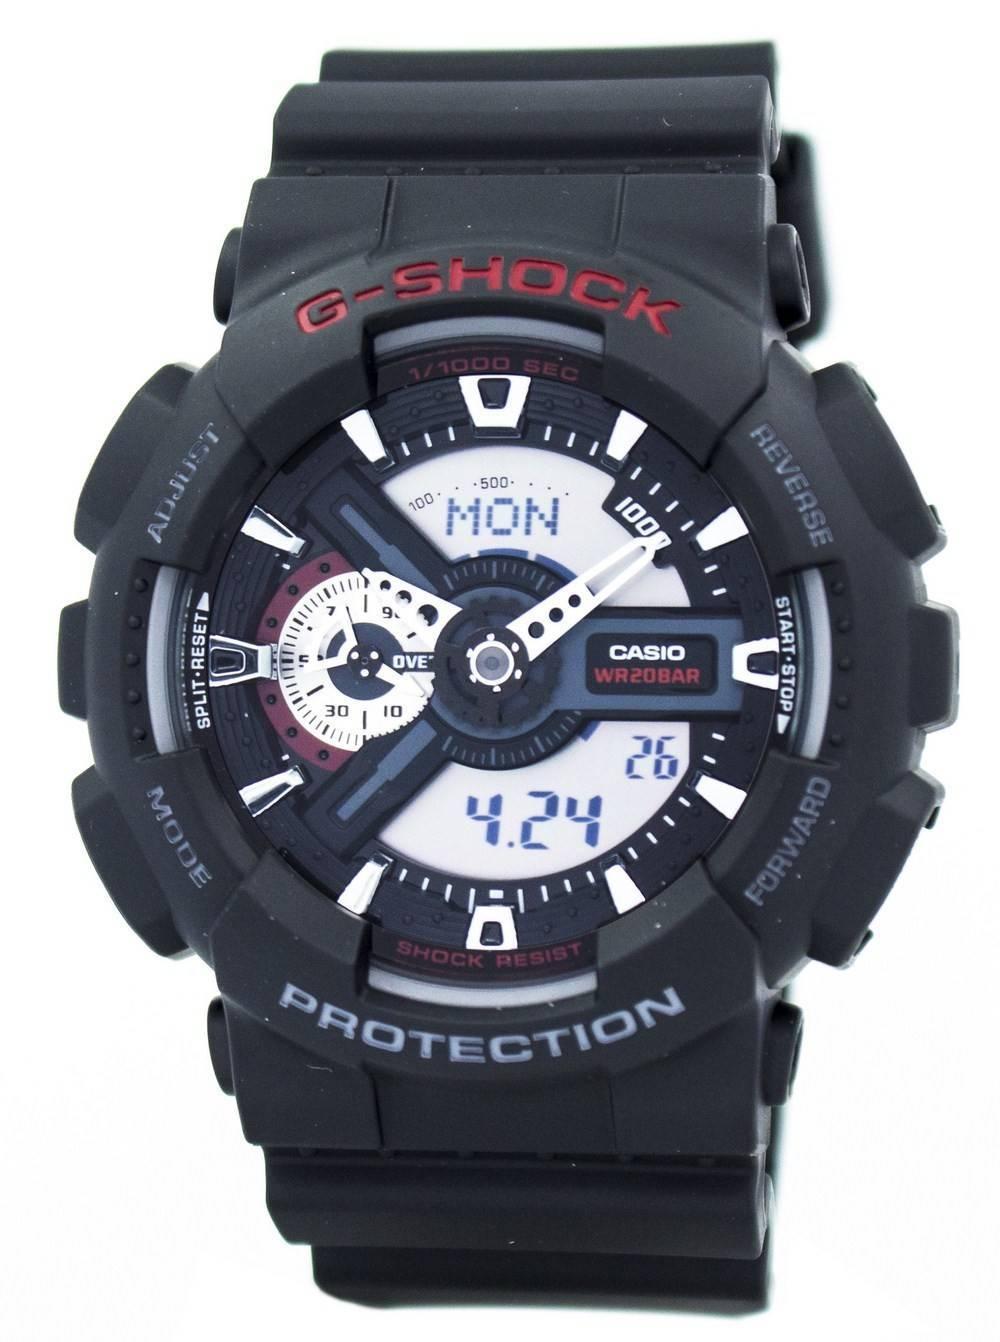 35954fb7b75 Details about Casio G-Shock World Time Analog Digital GA-110-1A GA110 Men s  Watch